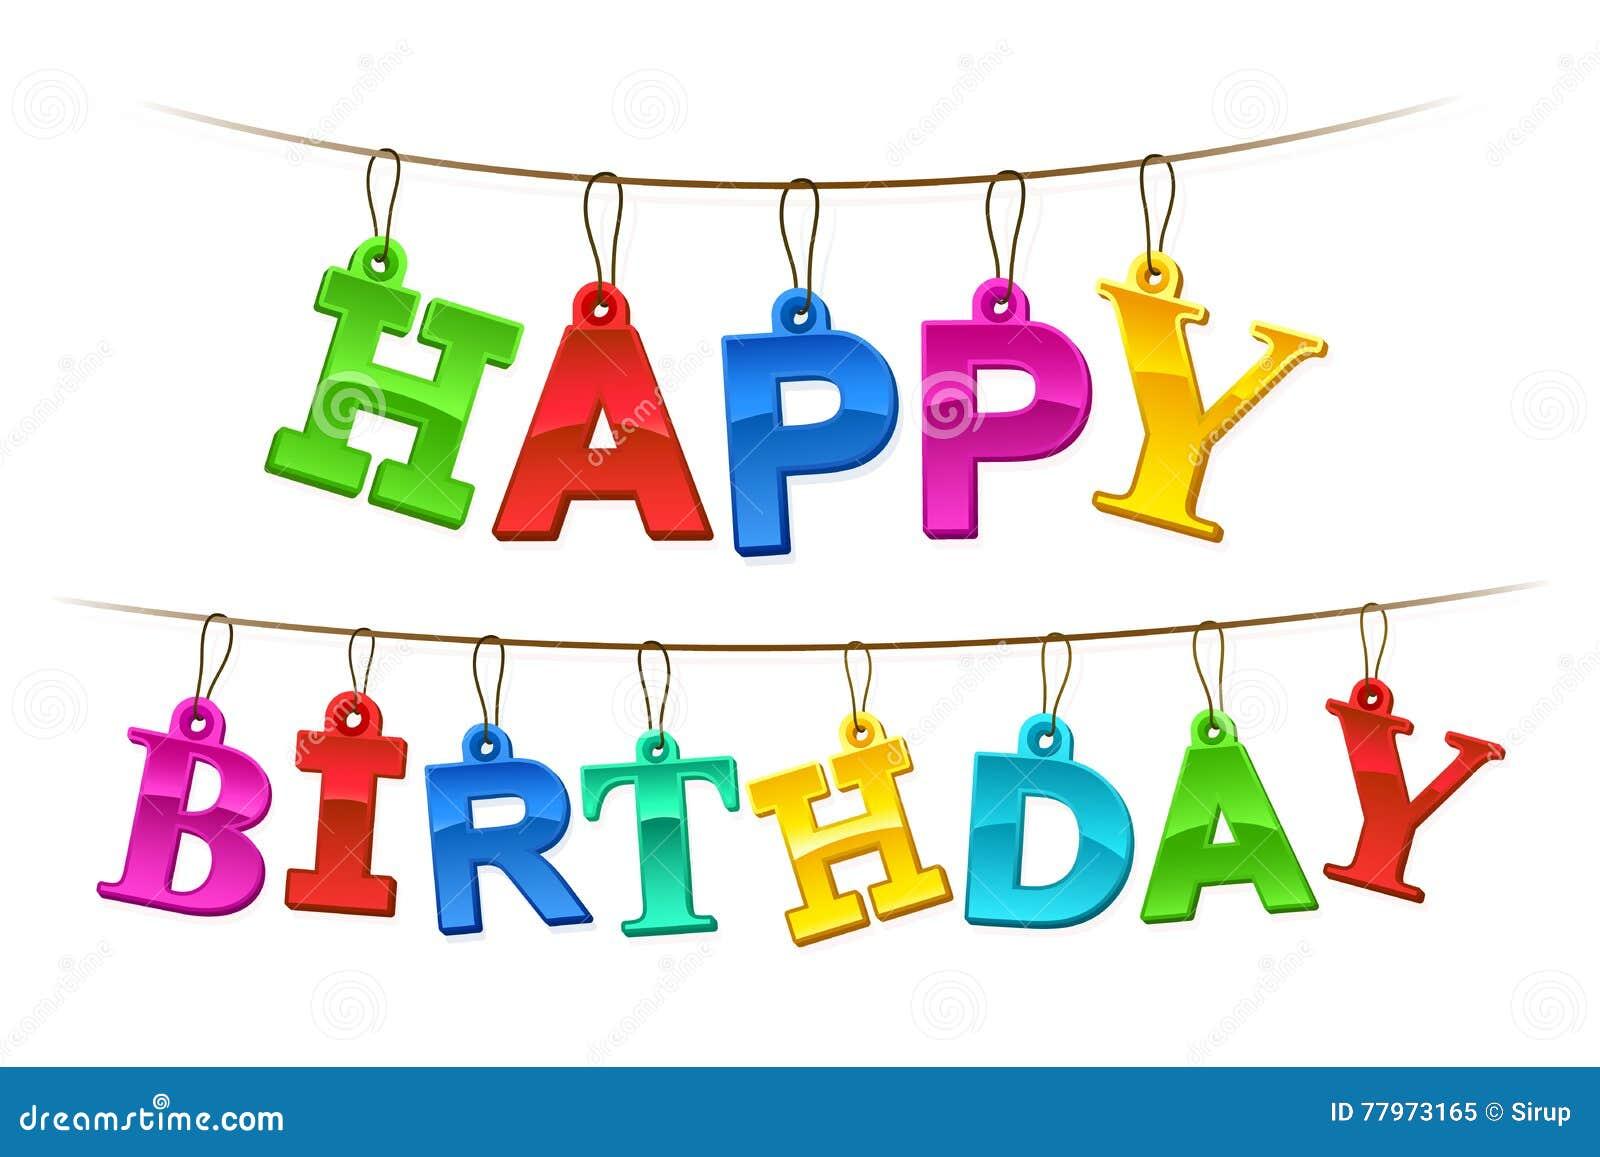 Rainbow Colored Happy Birthday Hanging Banner Stock Vector - Image: 77973165